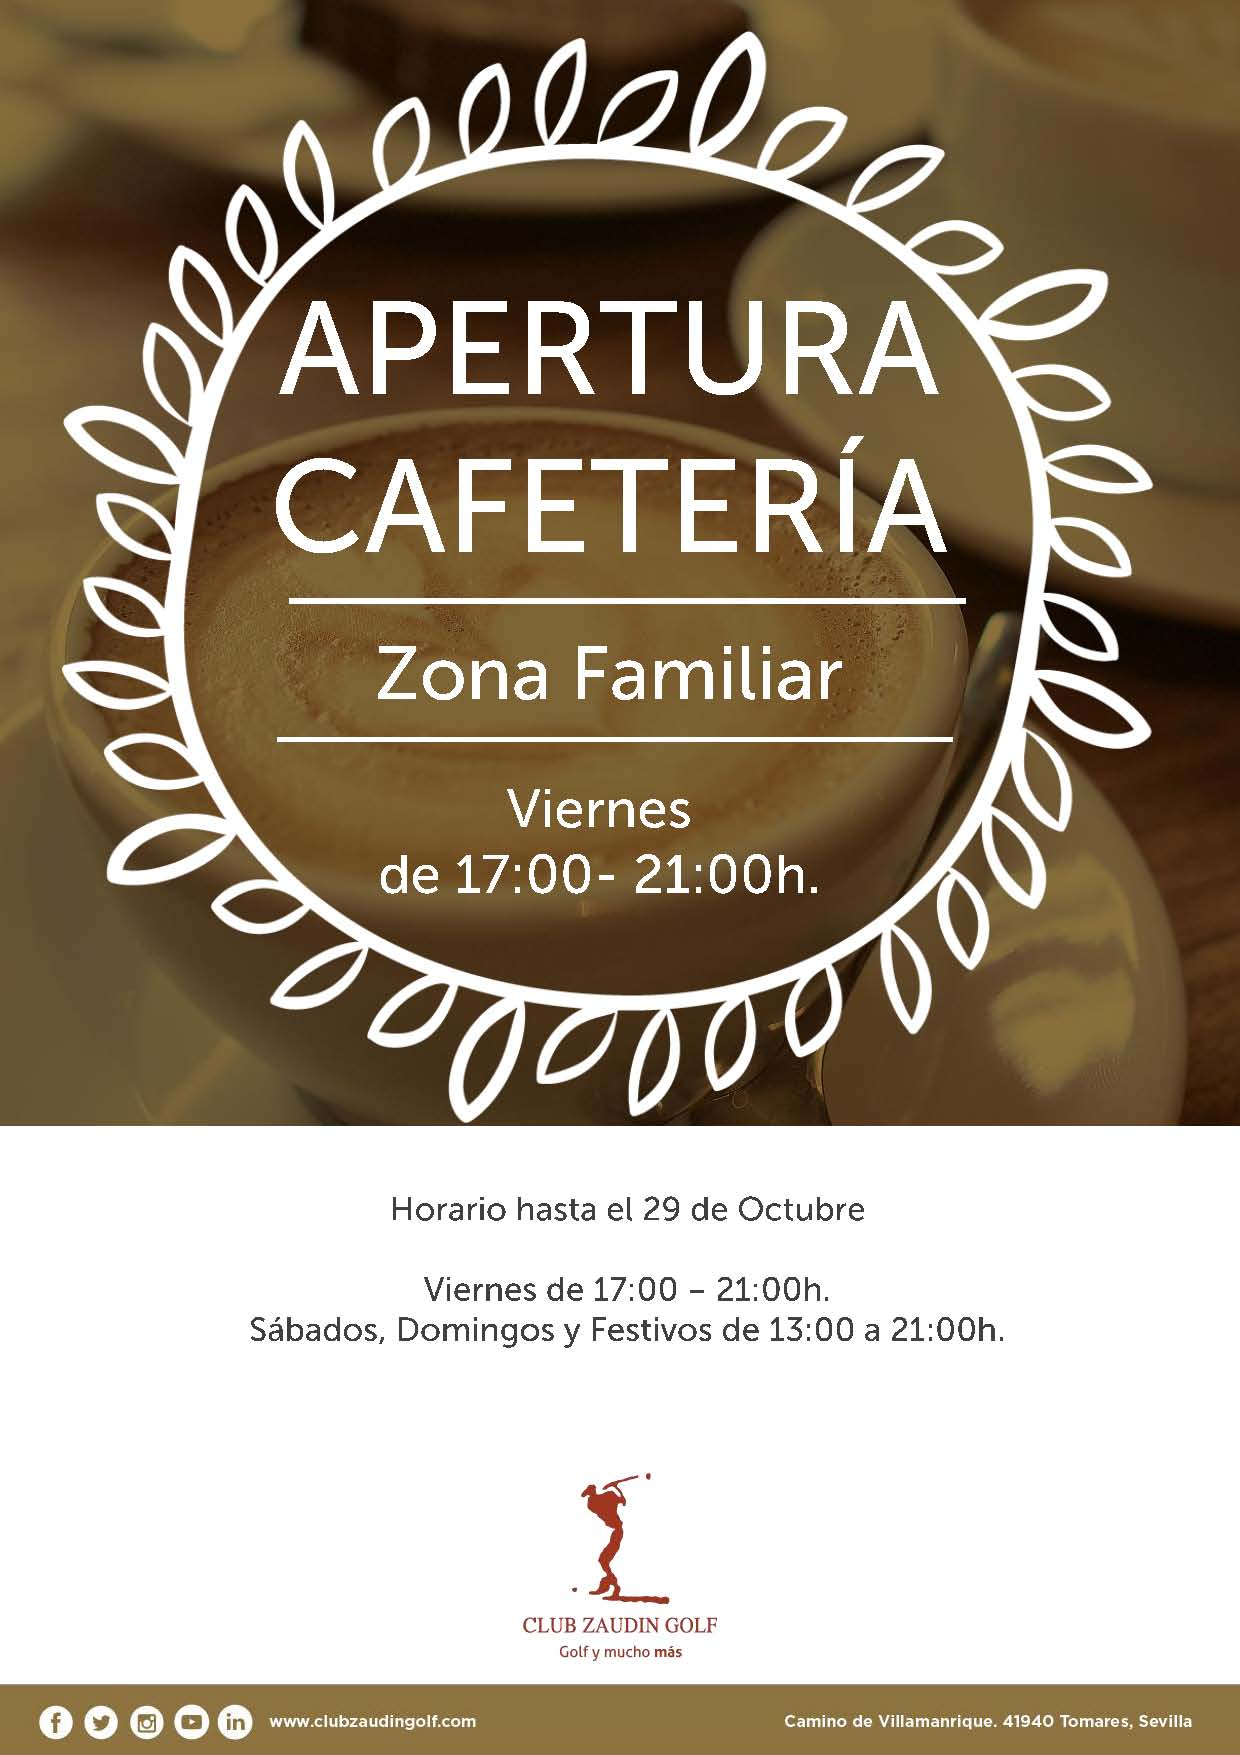 Horario Cafetería Zona Familiar